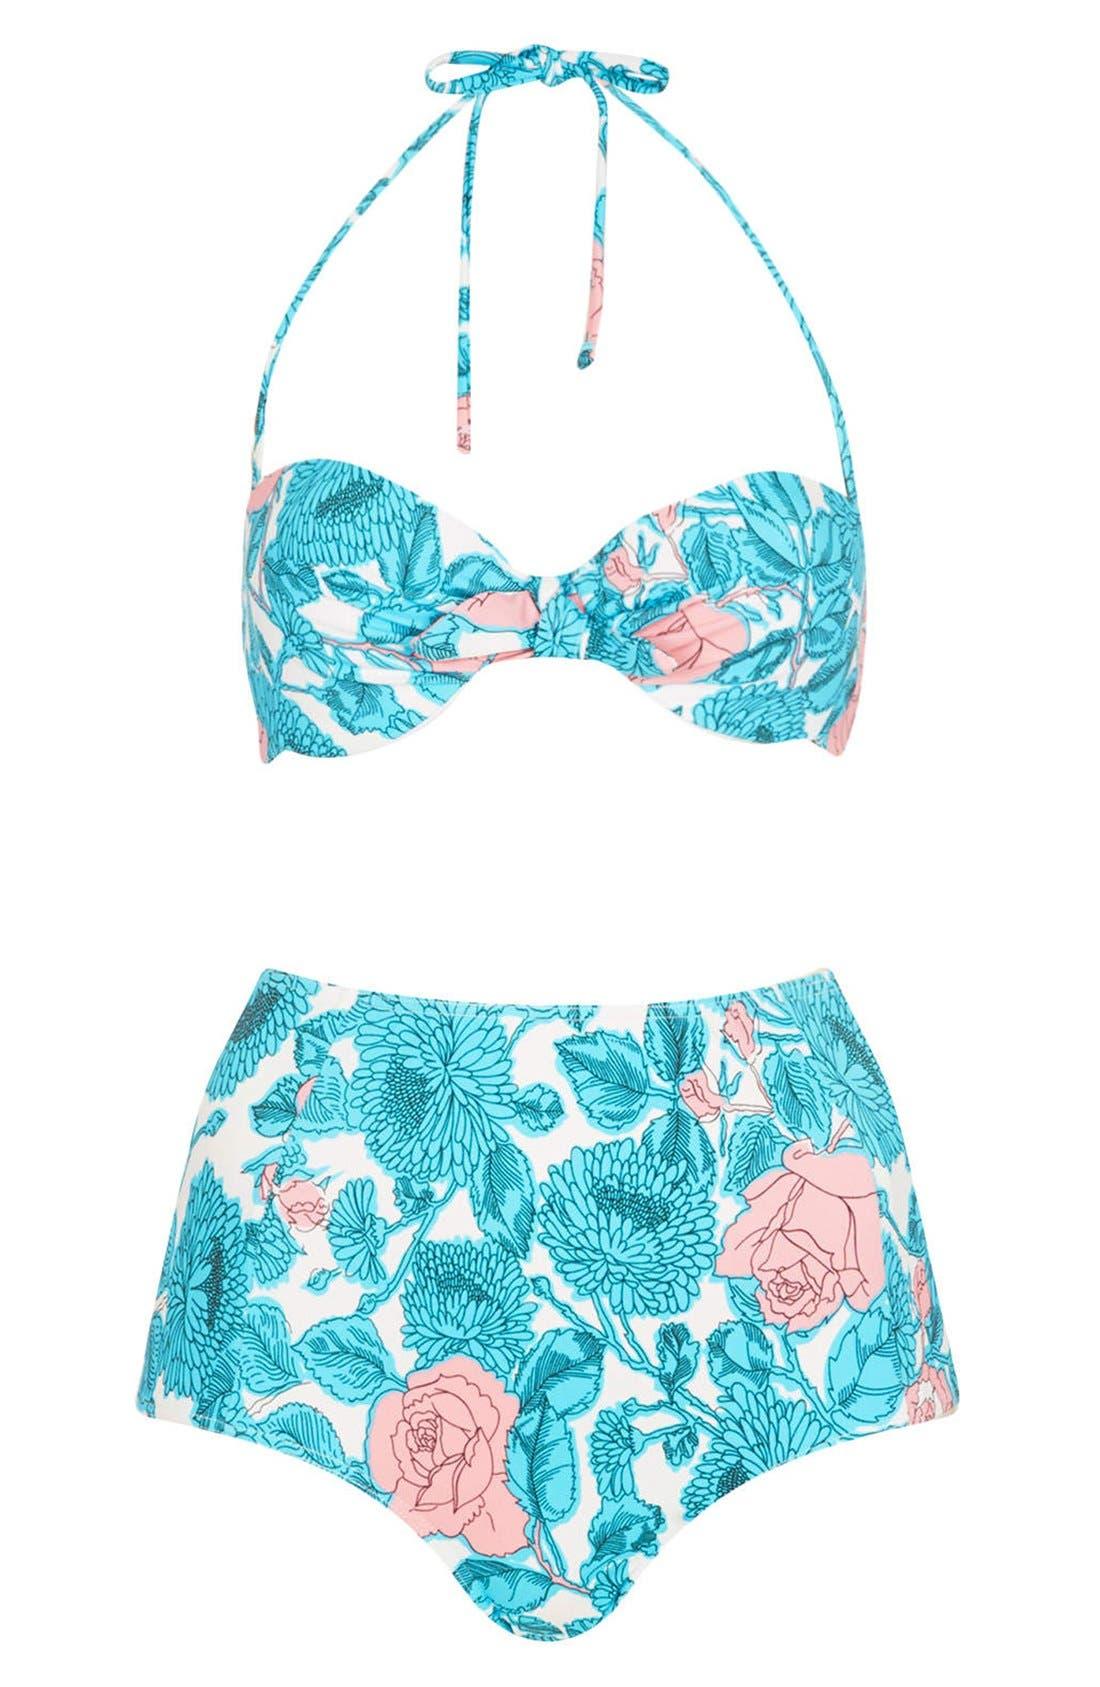 Alternate Image 1 Selected - Topshop 'Savannah' Plunge High Waist Floral Bikini